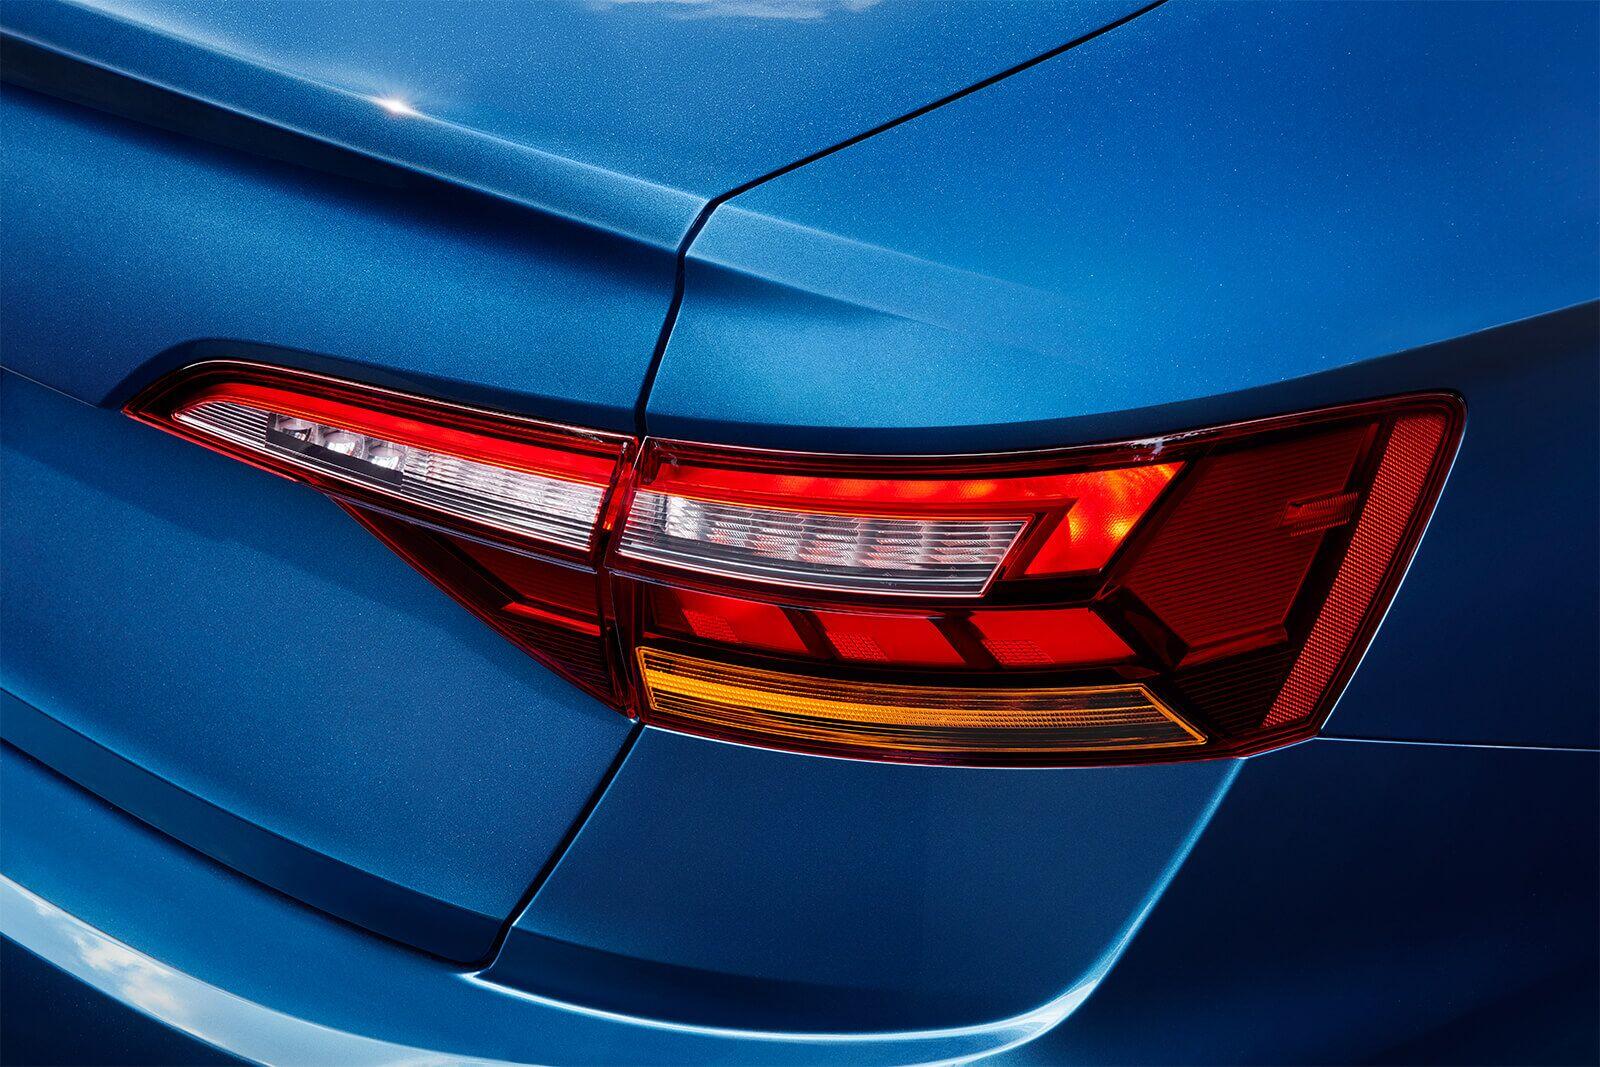 New 2019 Volkswagen Jetta LED taillights